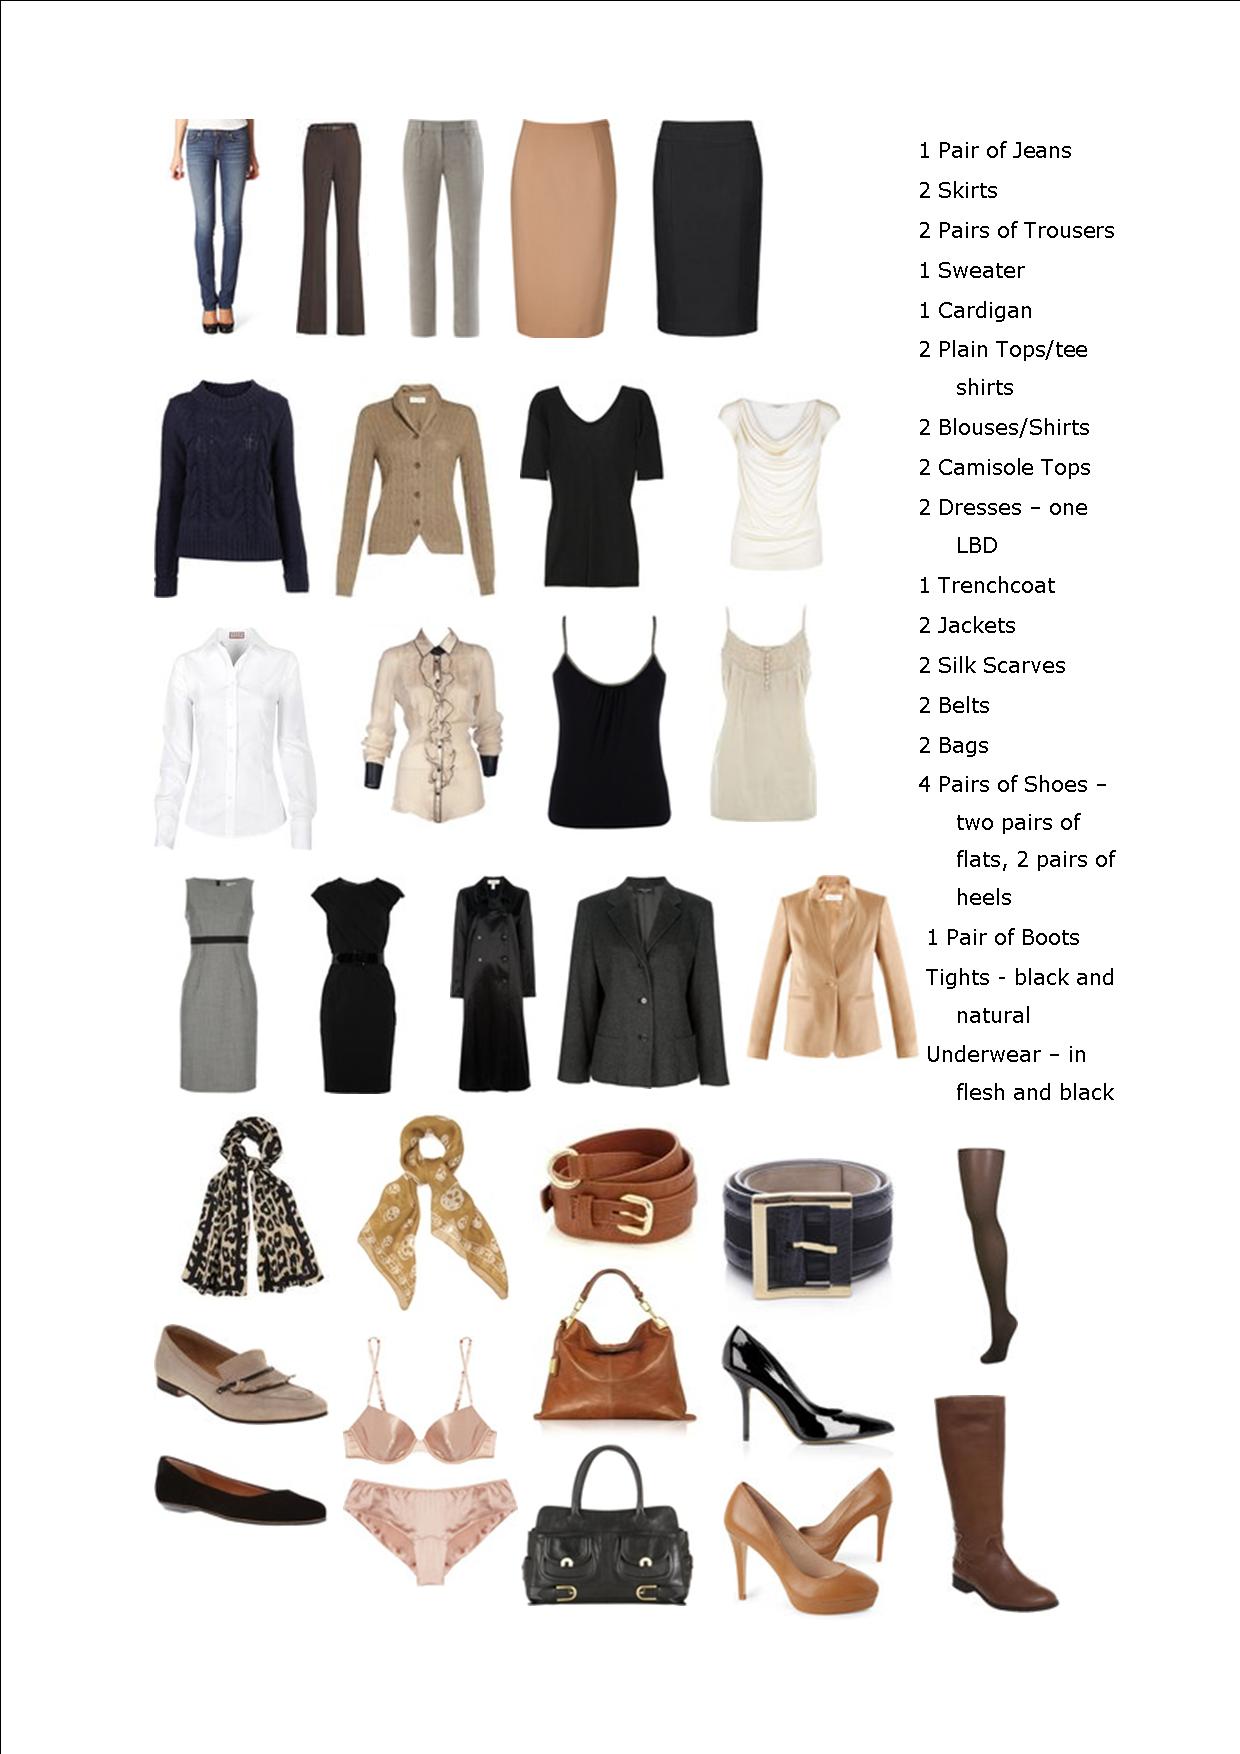 HELP I need some order in my wardrobe…… Oh wait I can help myself